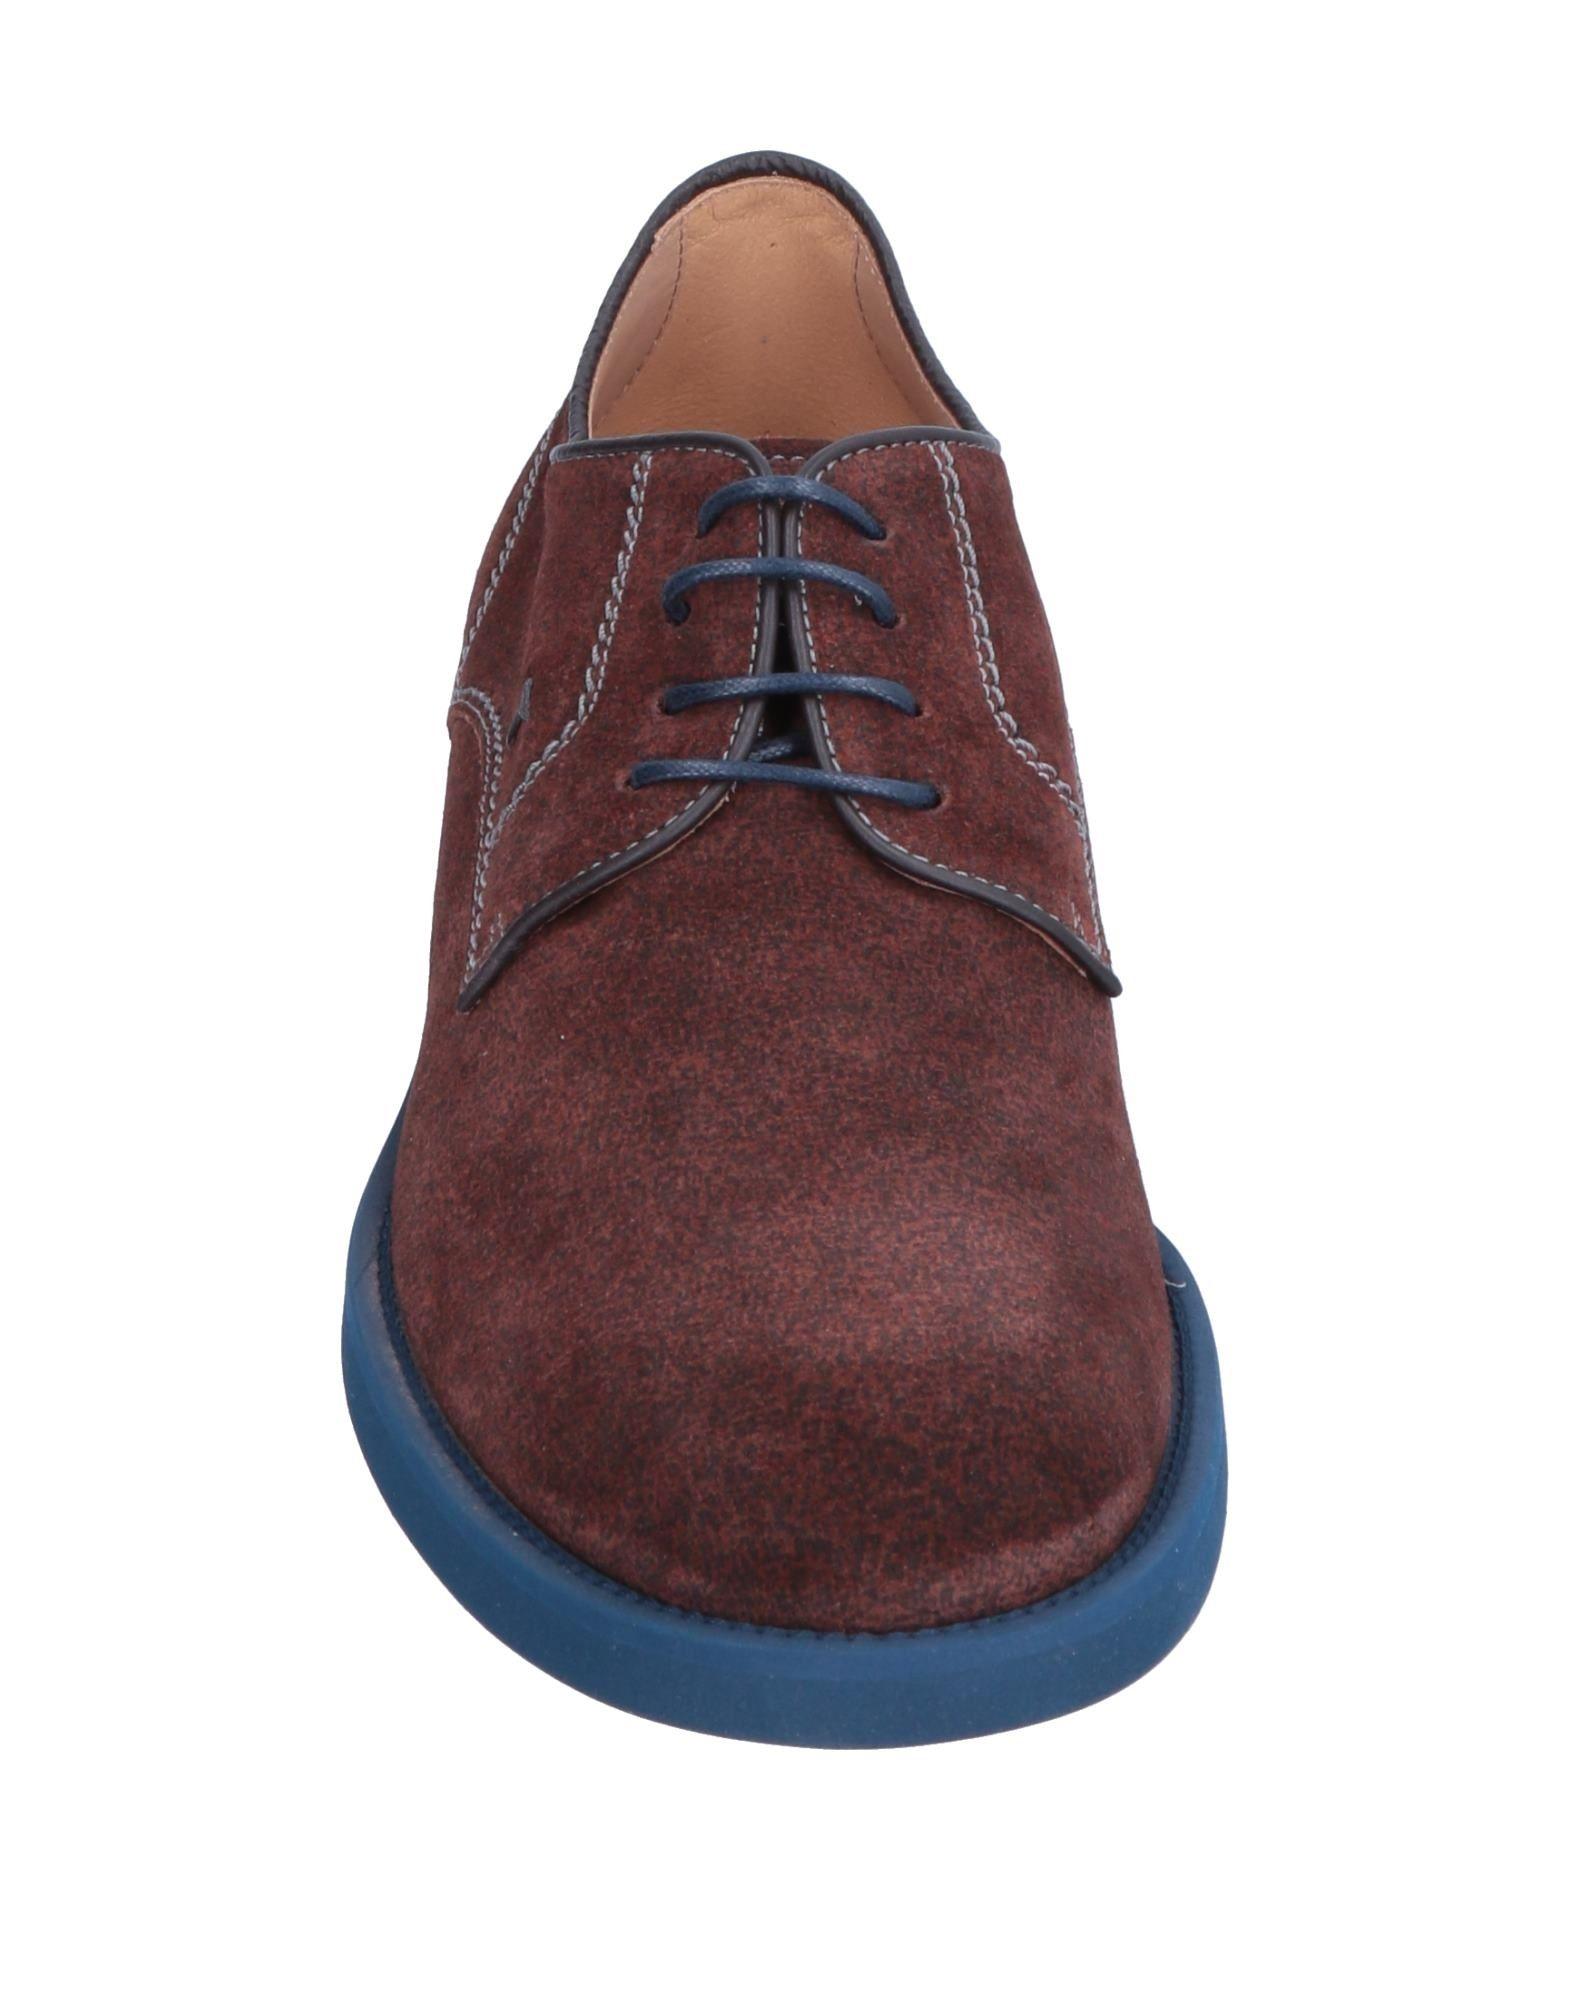 Tod's Gute Schnürschuhe Herren  11542426JP Gute Tod's Qualität beliebte Schuhe f2f188